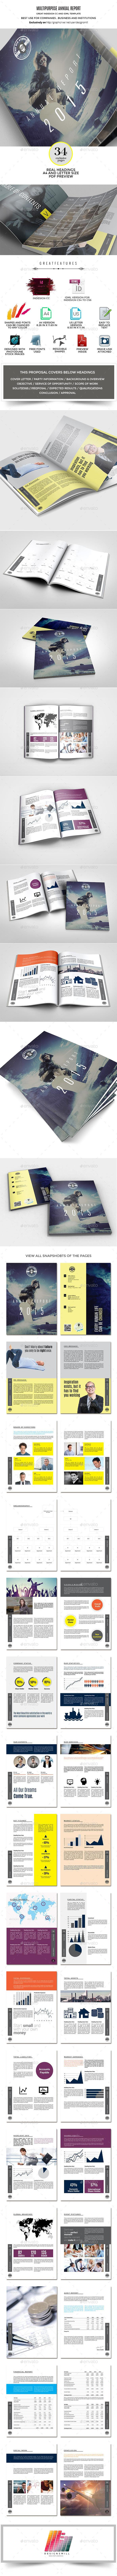 Big Stone Multipurpose Annual Report - Miscellaneous Print Templates